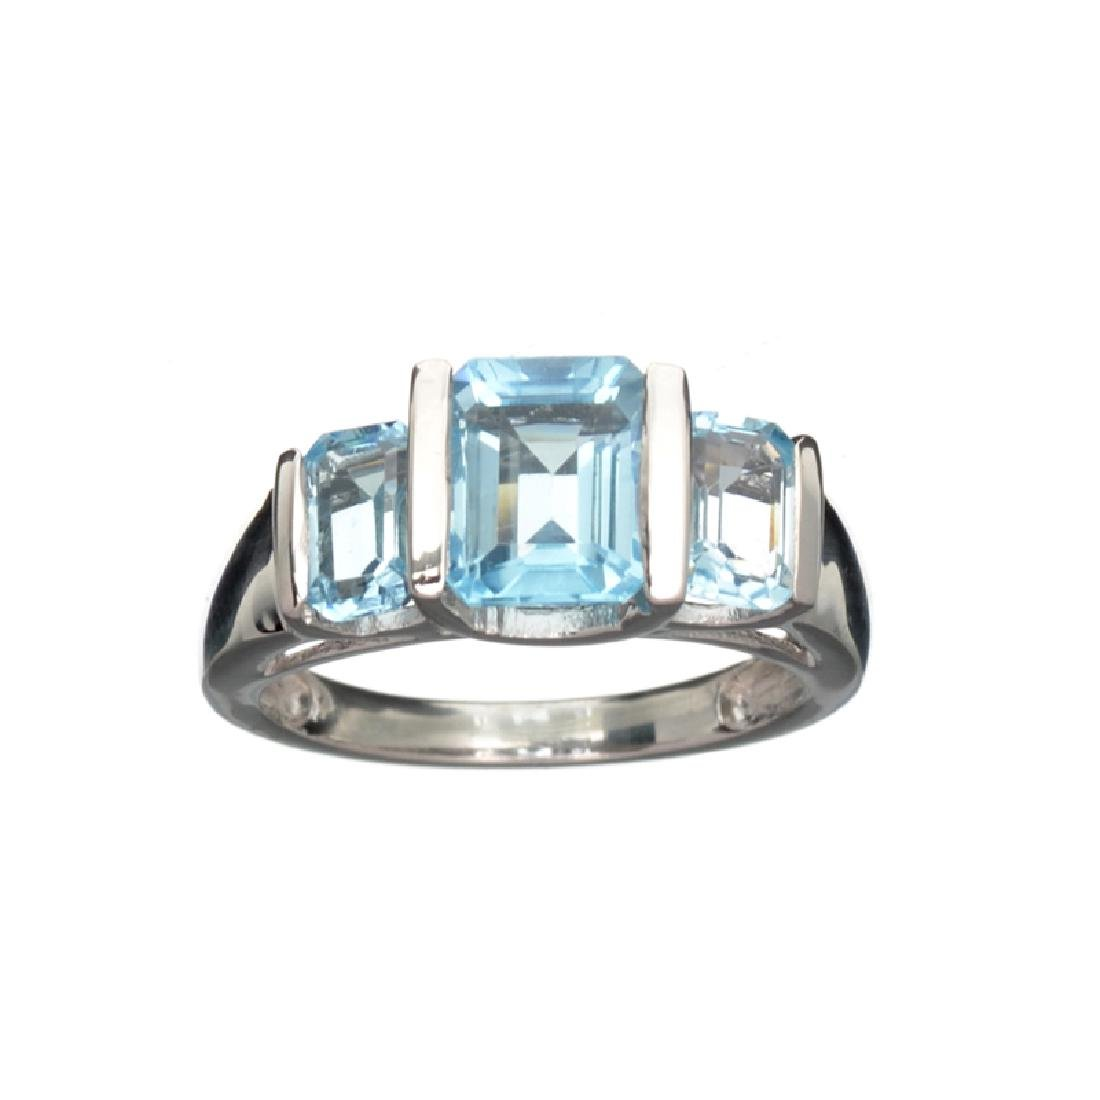 APP: 0.4k Fine Jewelry 3.21CT Rectangular Cut Blue